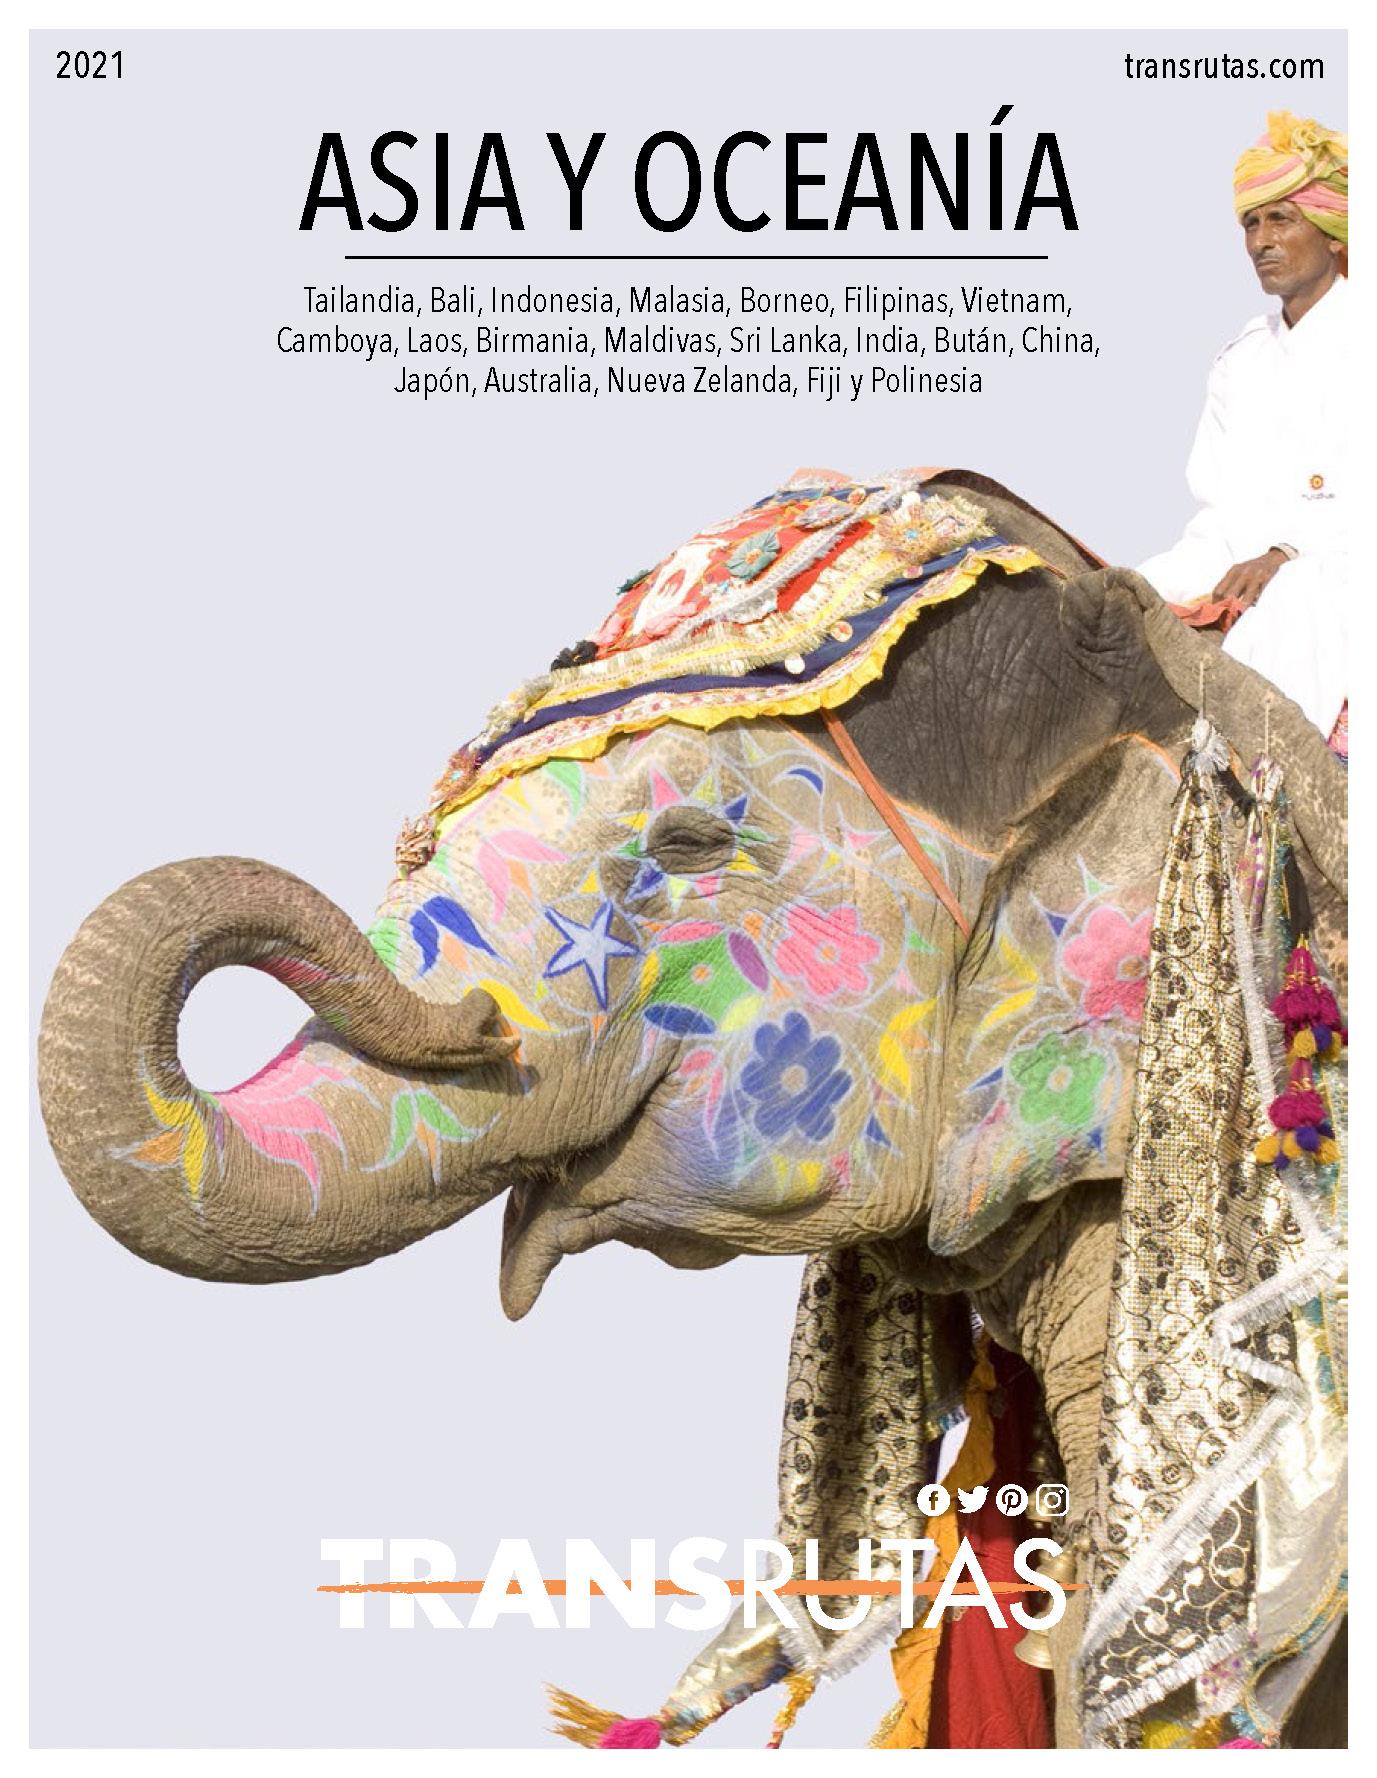 Catalogo Transrutas Asia y Oceania 2021